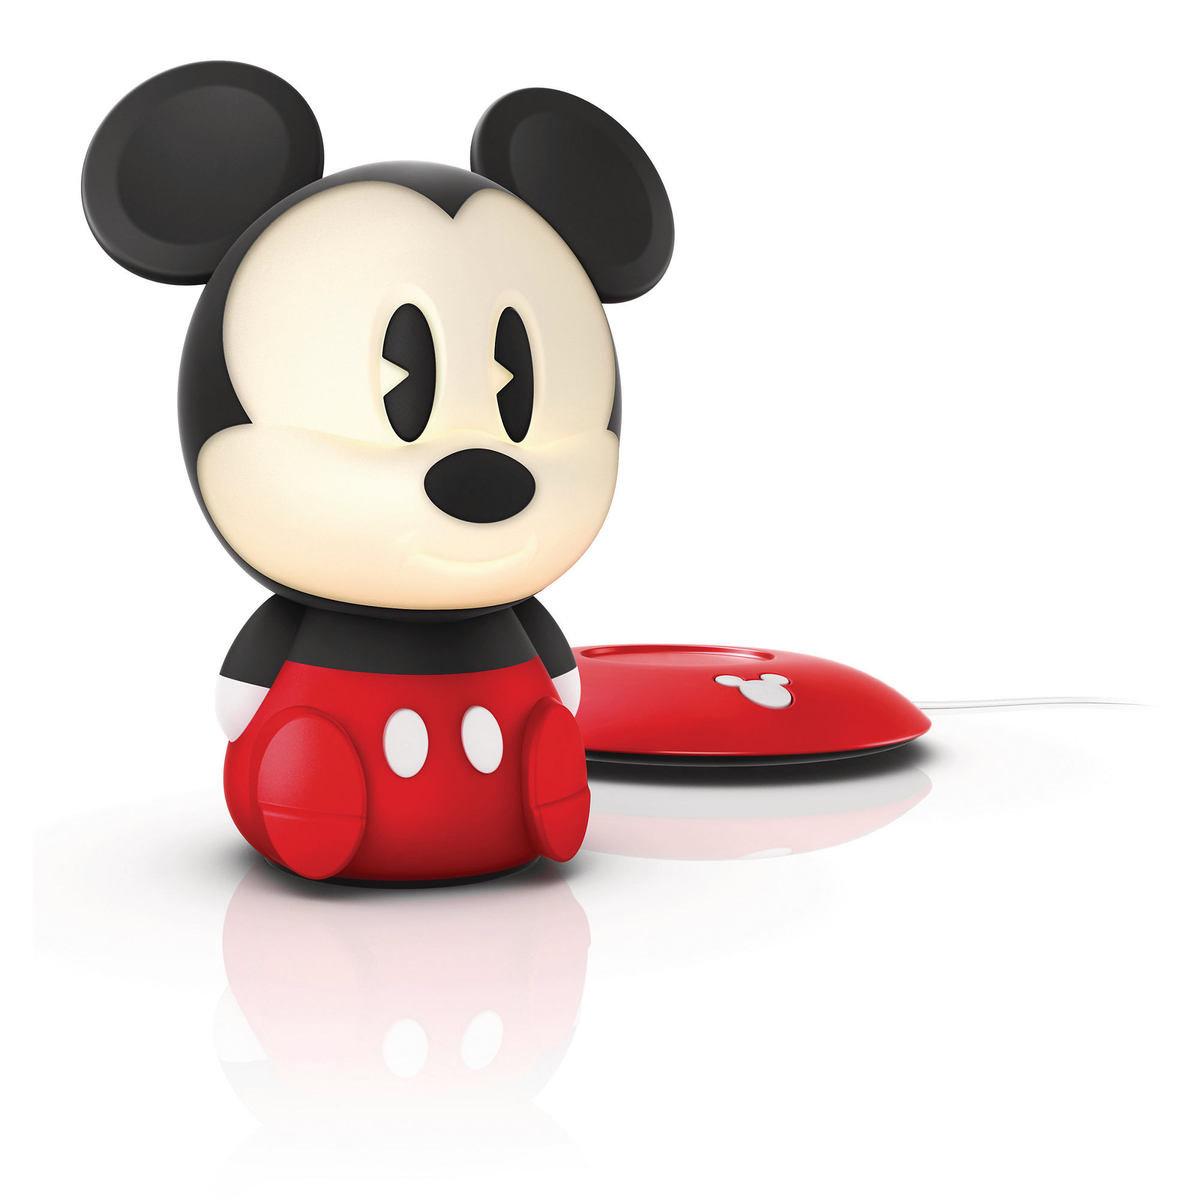 71709 Disney SoftPal 米奇 LED 檯燈